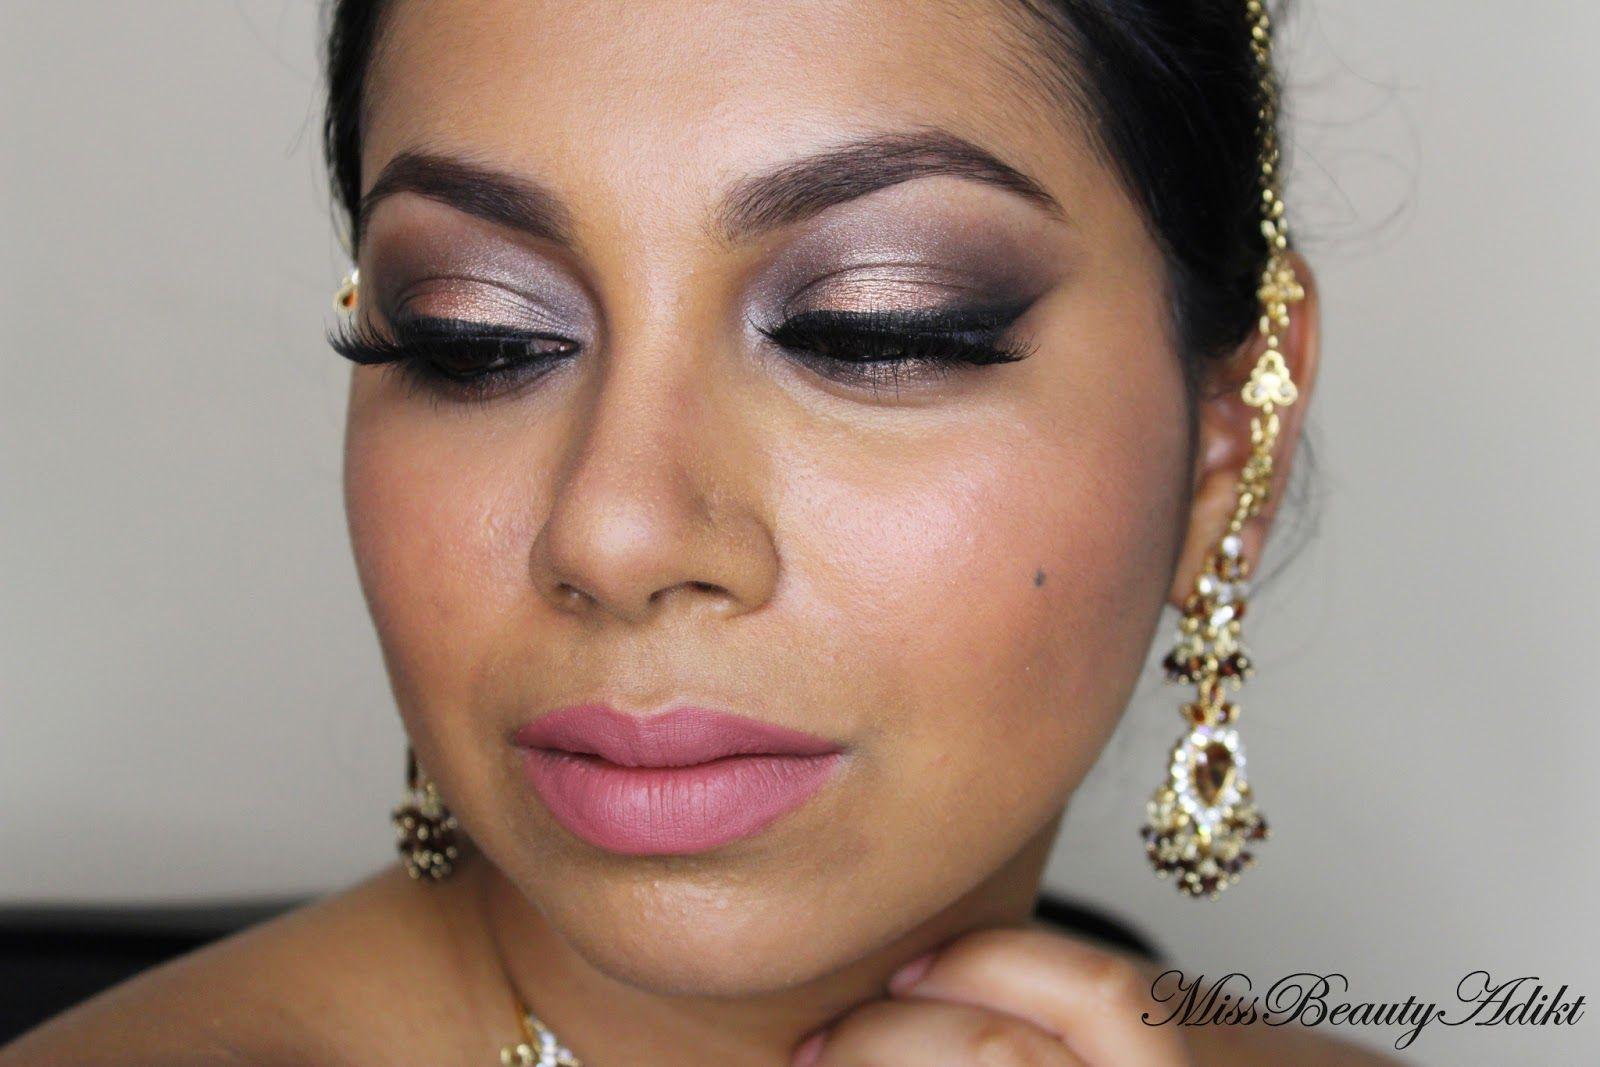 Makeup Revolution Ultra 32 Eyeshadow Palette in Flawless